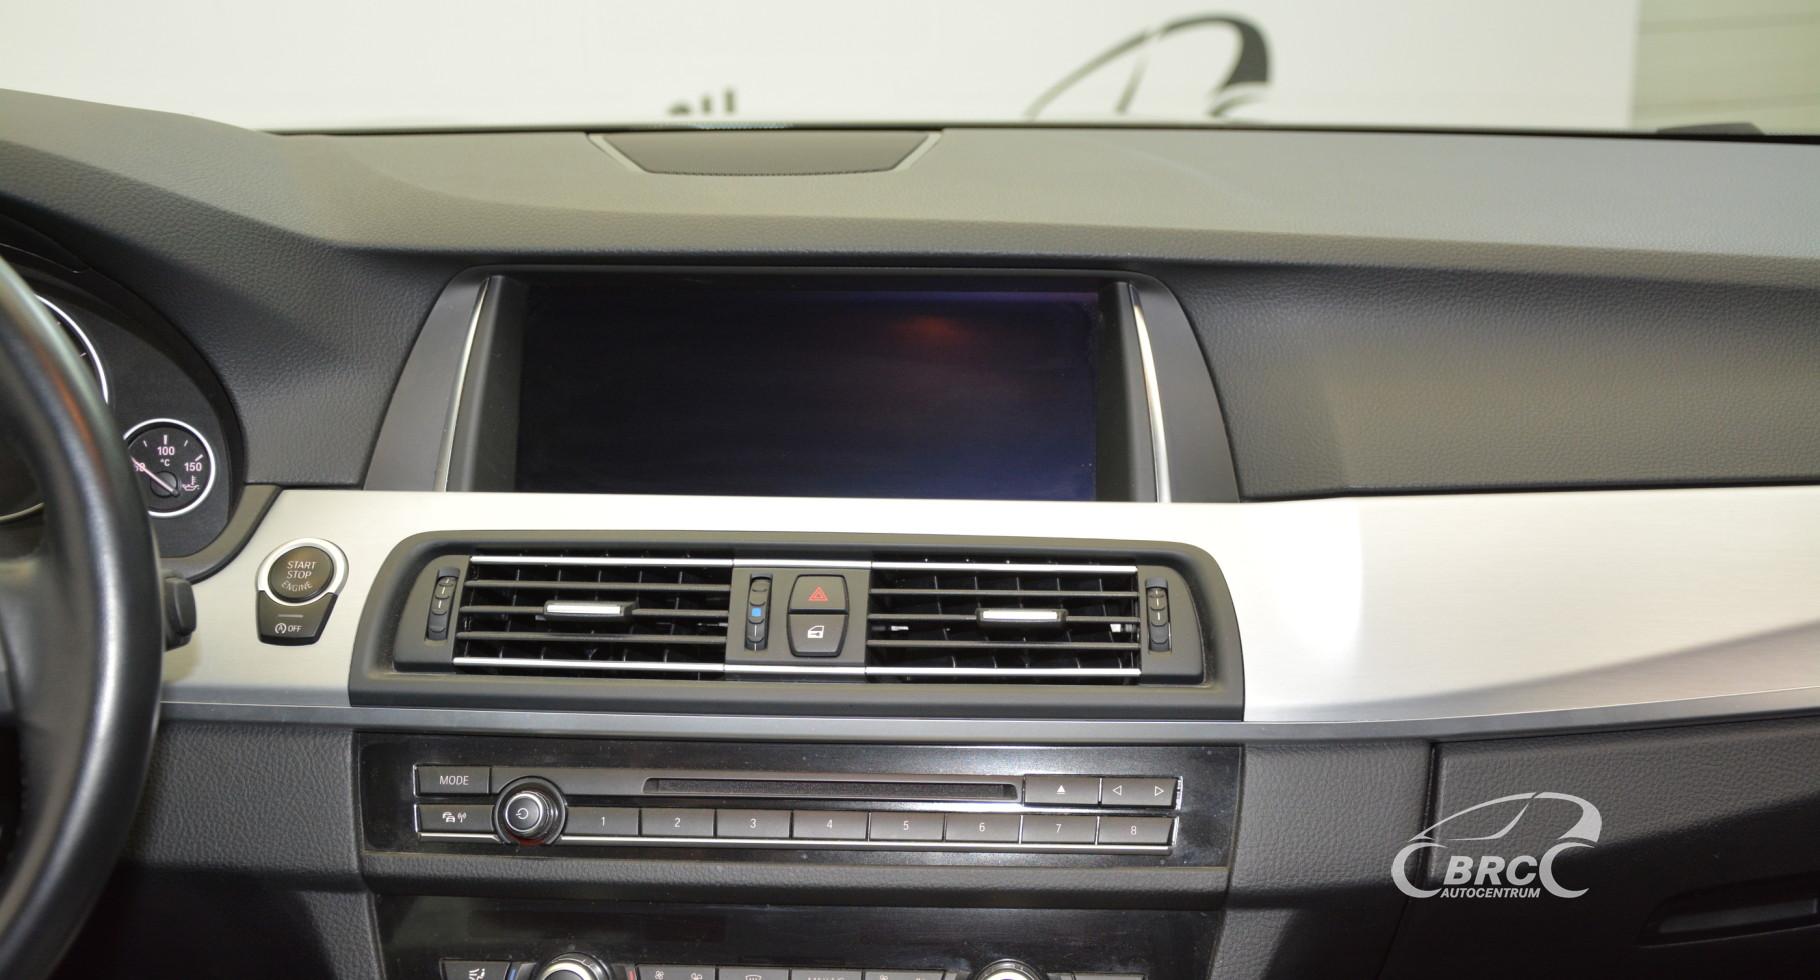 BMW 520 xDrive Automatas